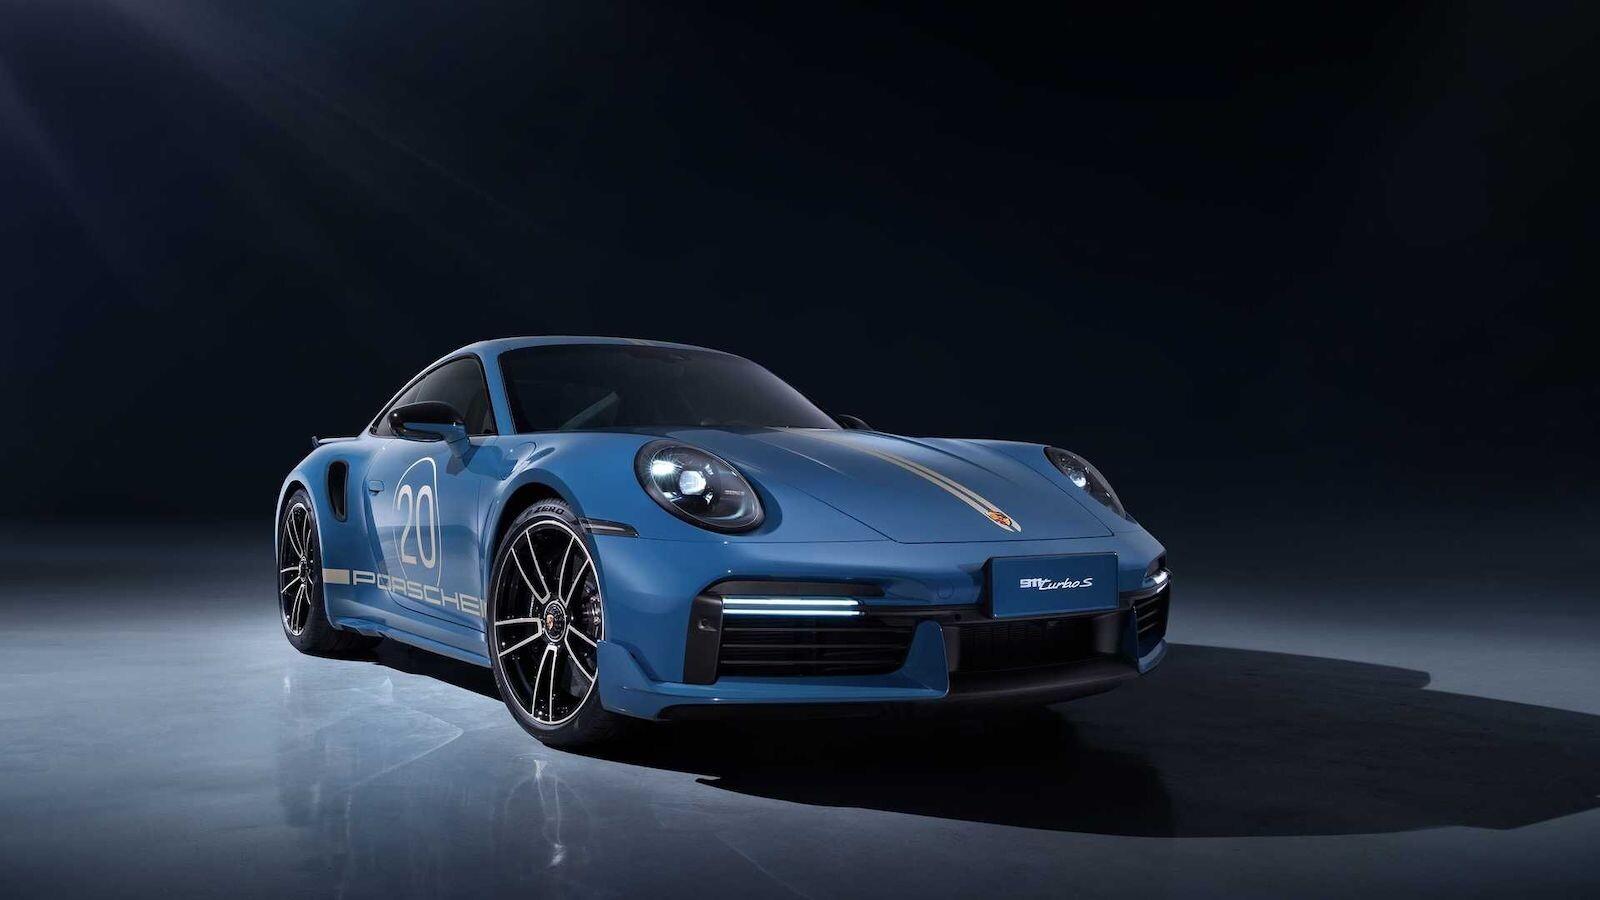 Foto de Porsche 911 20 Aniversario en China (1/9)